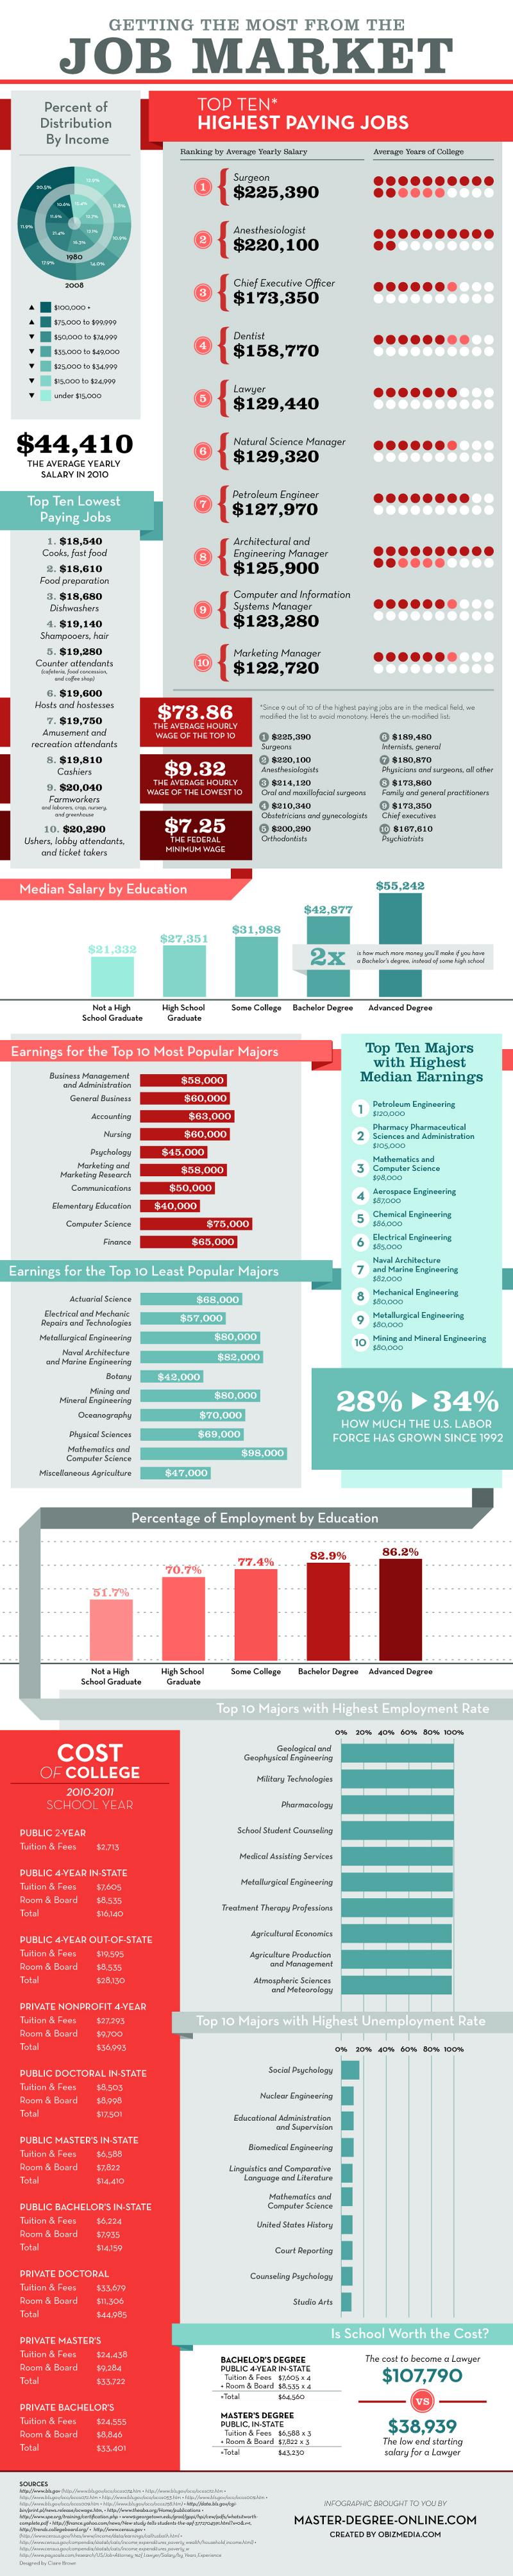 Job Market Salary Statistics